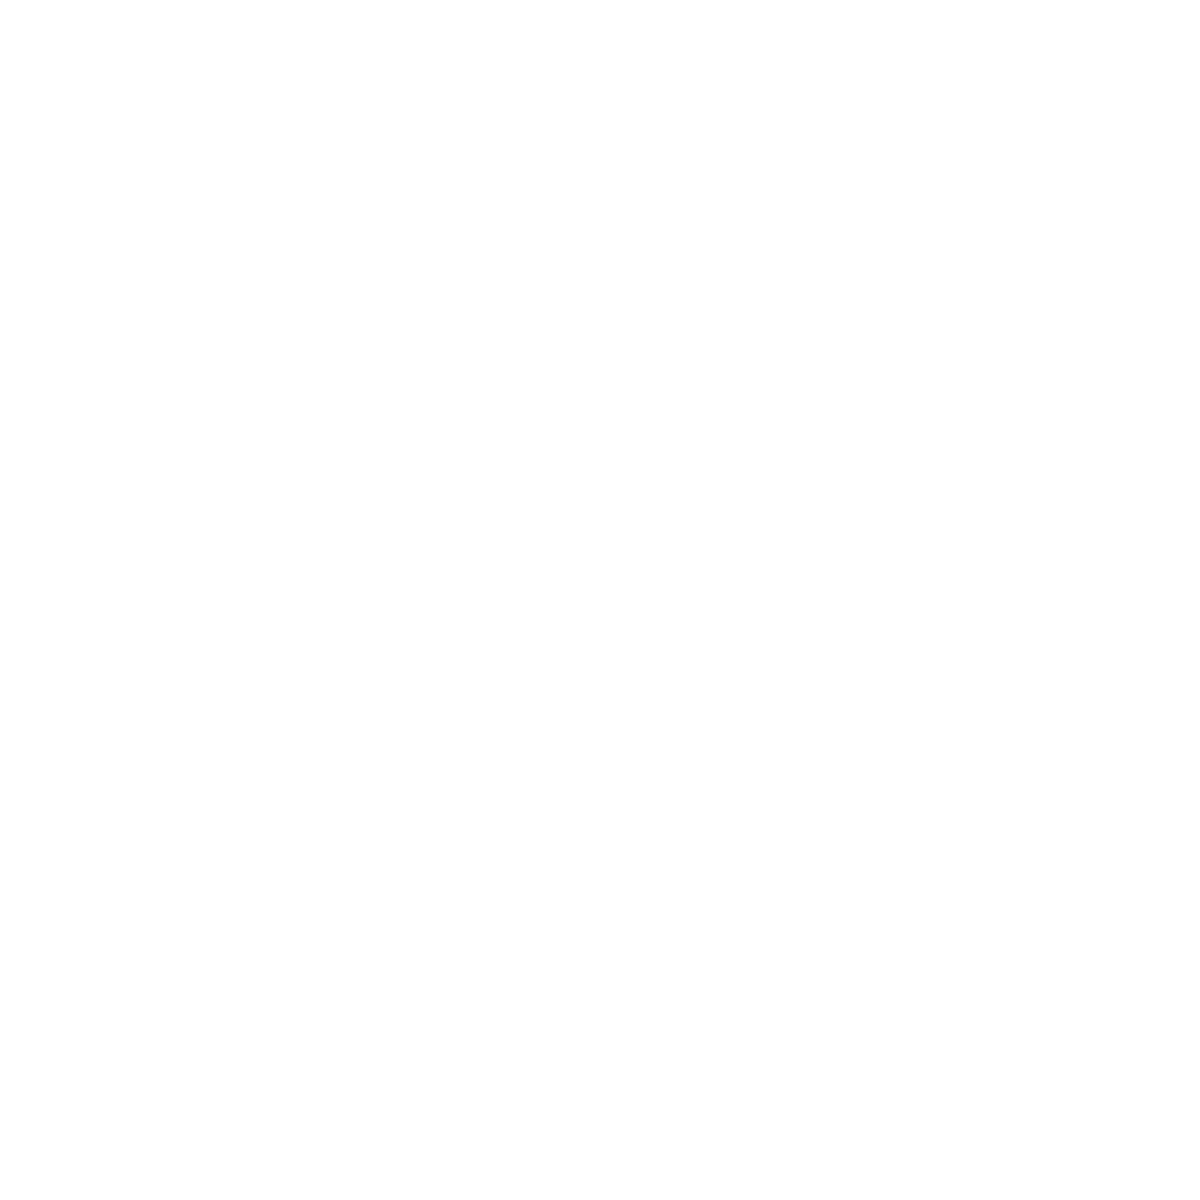 清柚教育Lite – Cheersyou